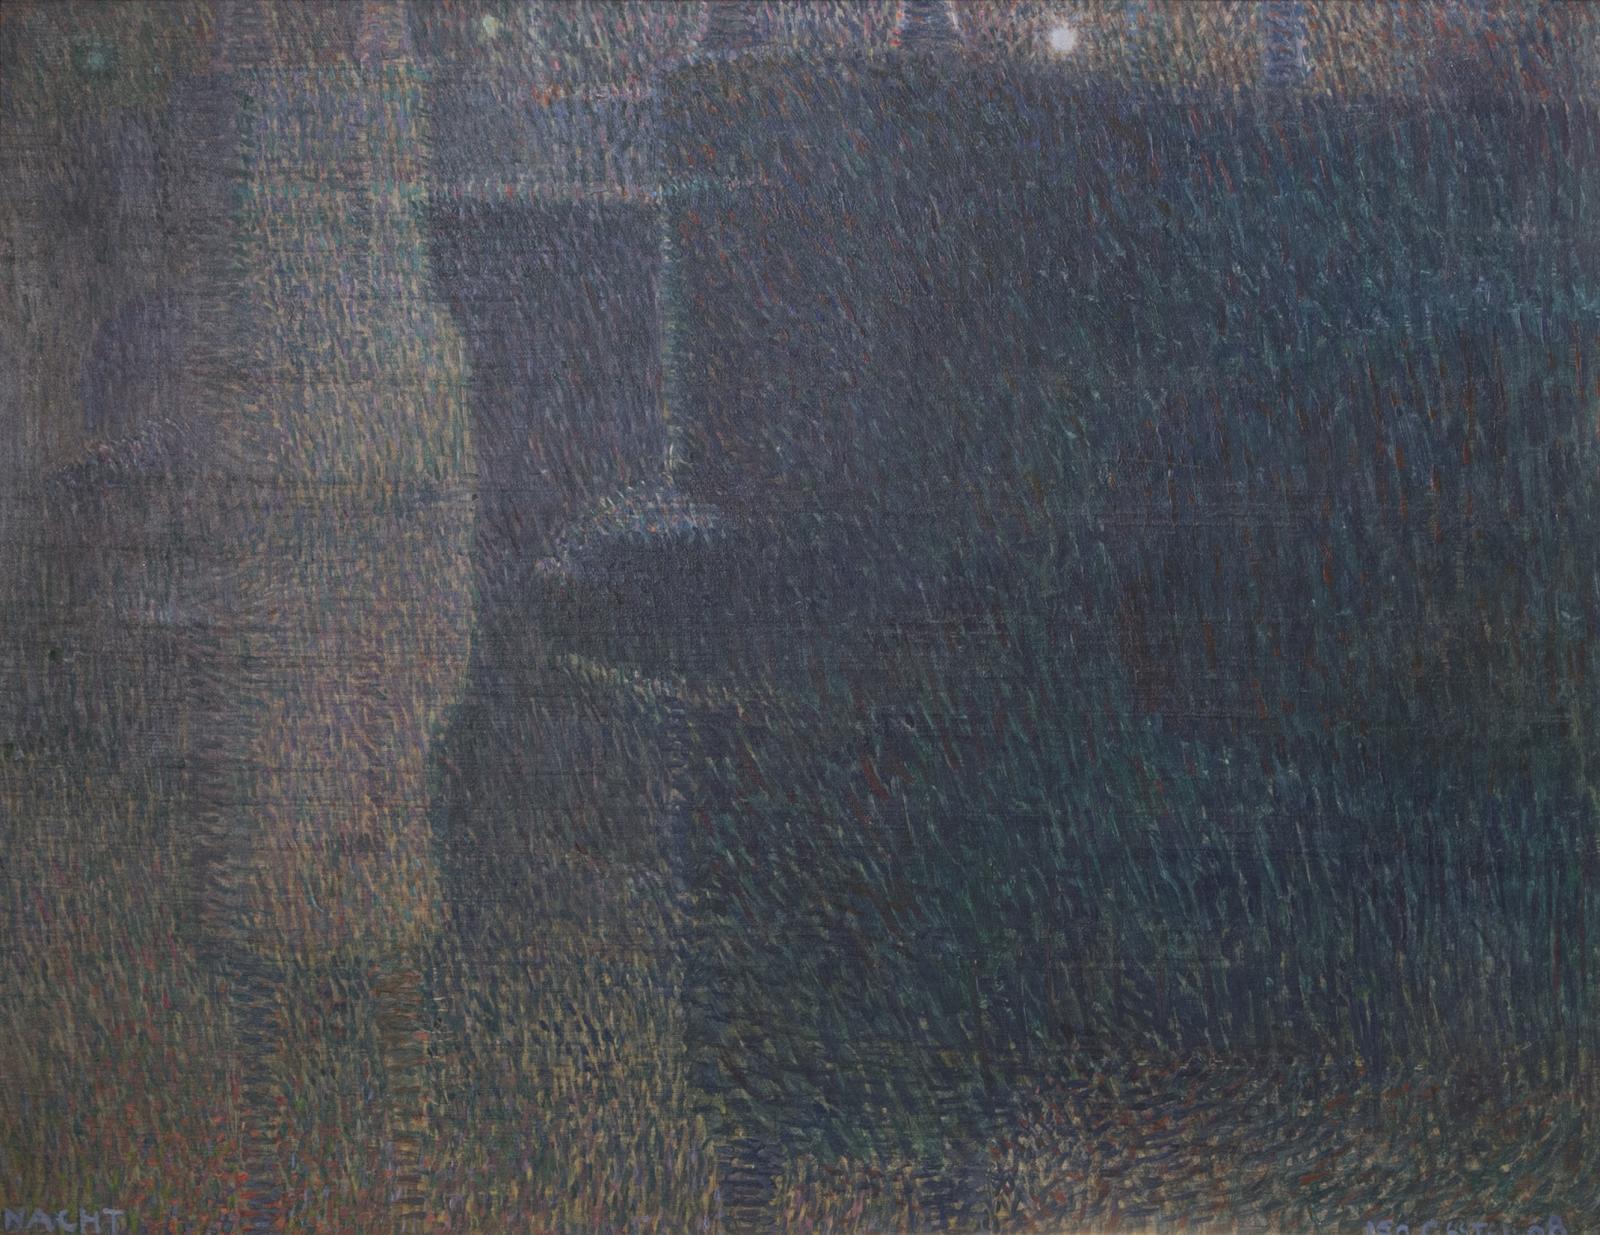 Leo Gestel, Nacht (Amstelbrug in Amsterdam), 1908